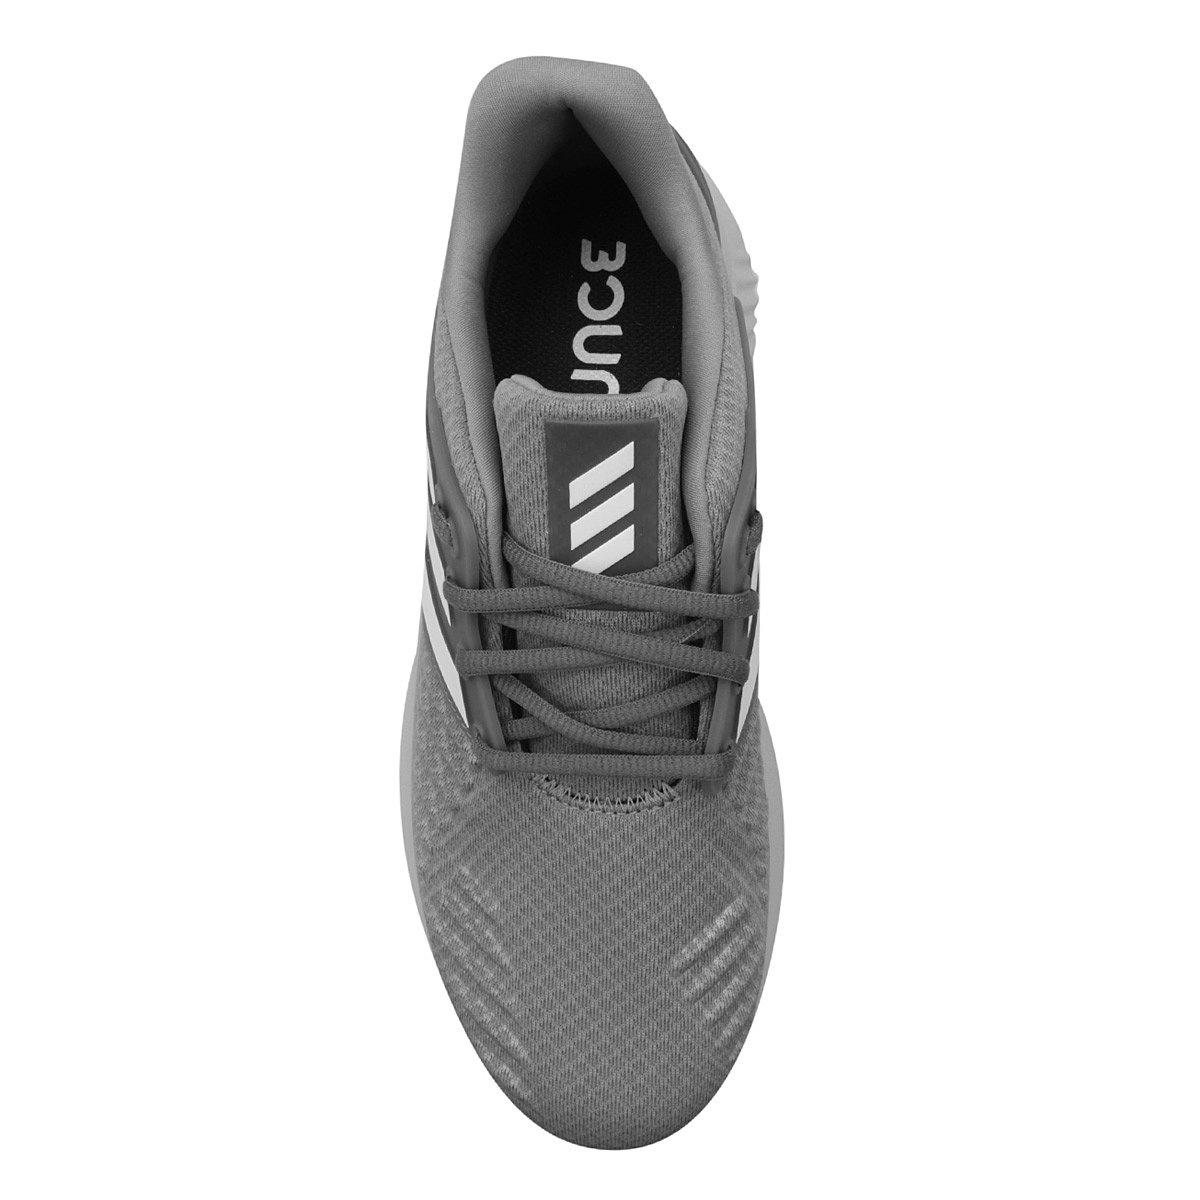 RC Masculino Adidas Cinza Tênis Tênis e Adidas Alphabounce Alphabounce Branco RC PIIqY0Rw